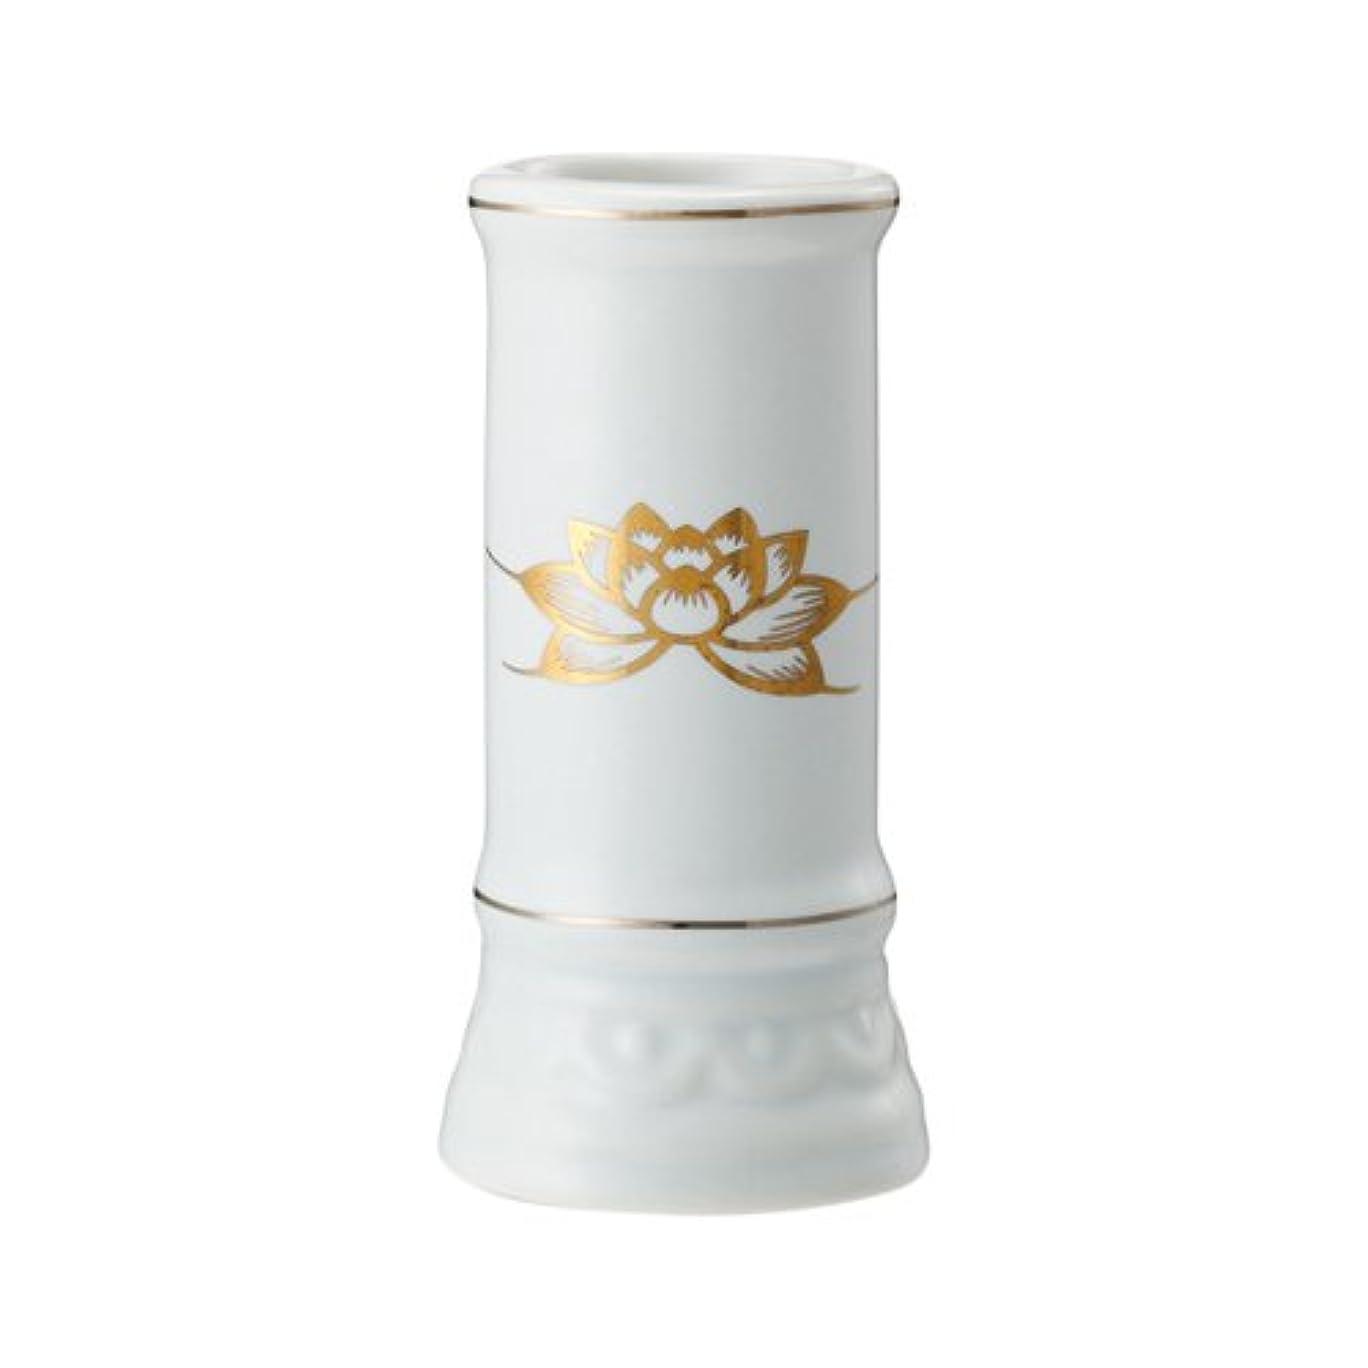 百万音楽家人道的日本香堂 線香立て ミニ陶器白磁